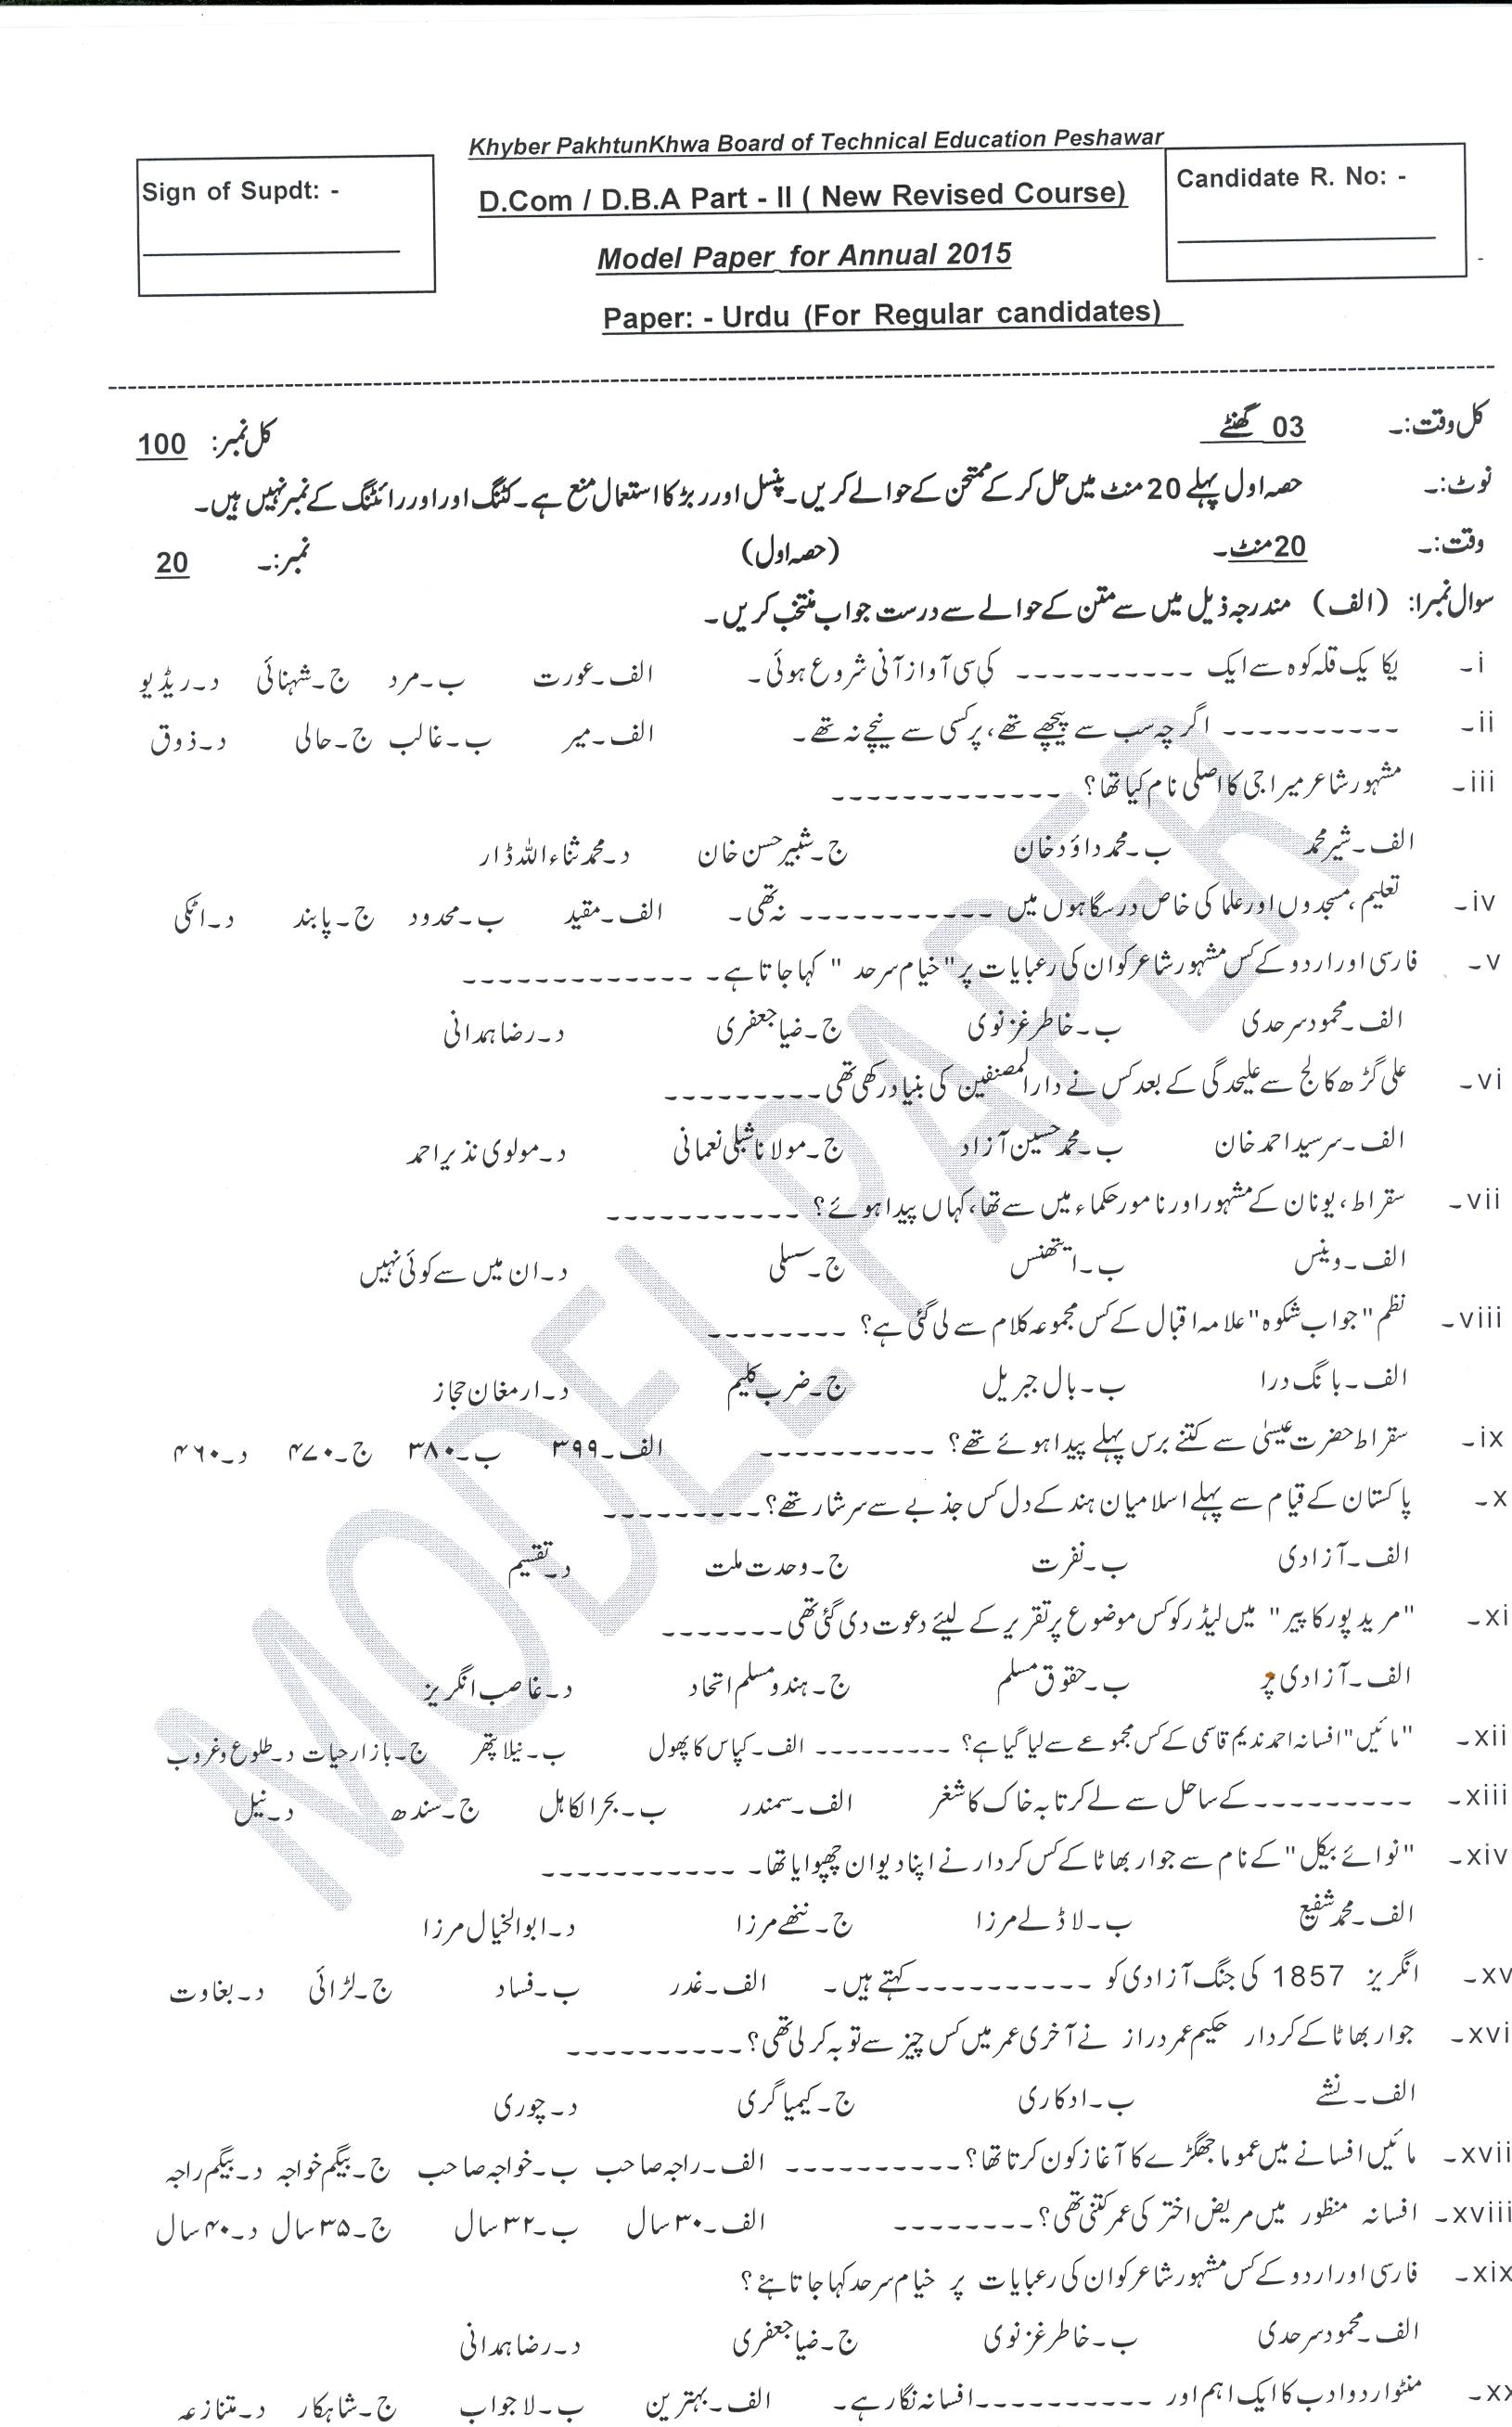 KPK Board of Technical Education Peshawar Model Papers 2019